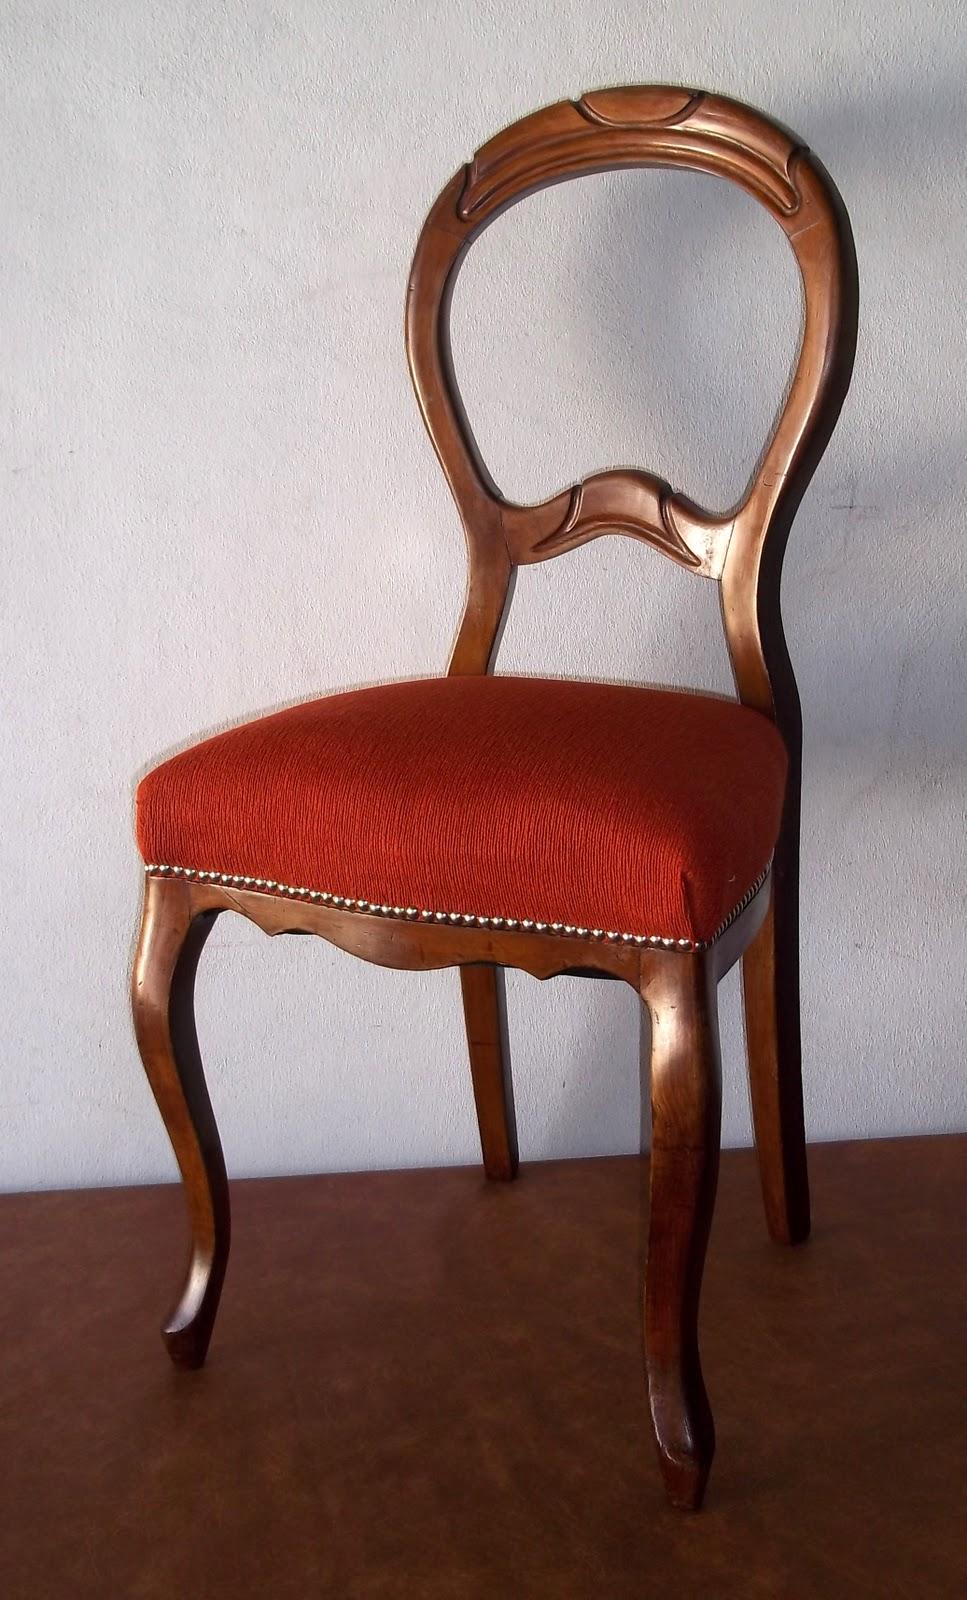 Disegno bufo sillas de estilo victoriano for Sillas para viejitos